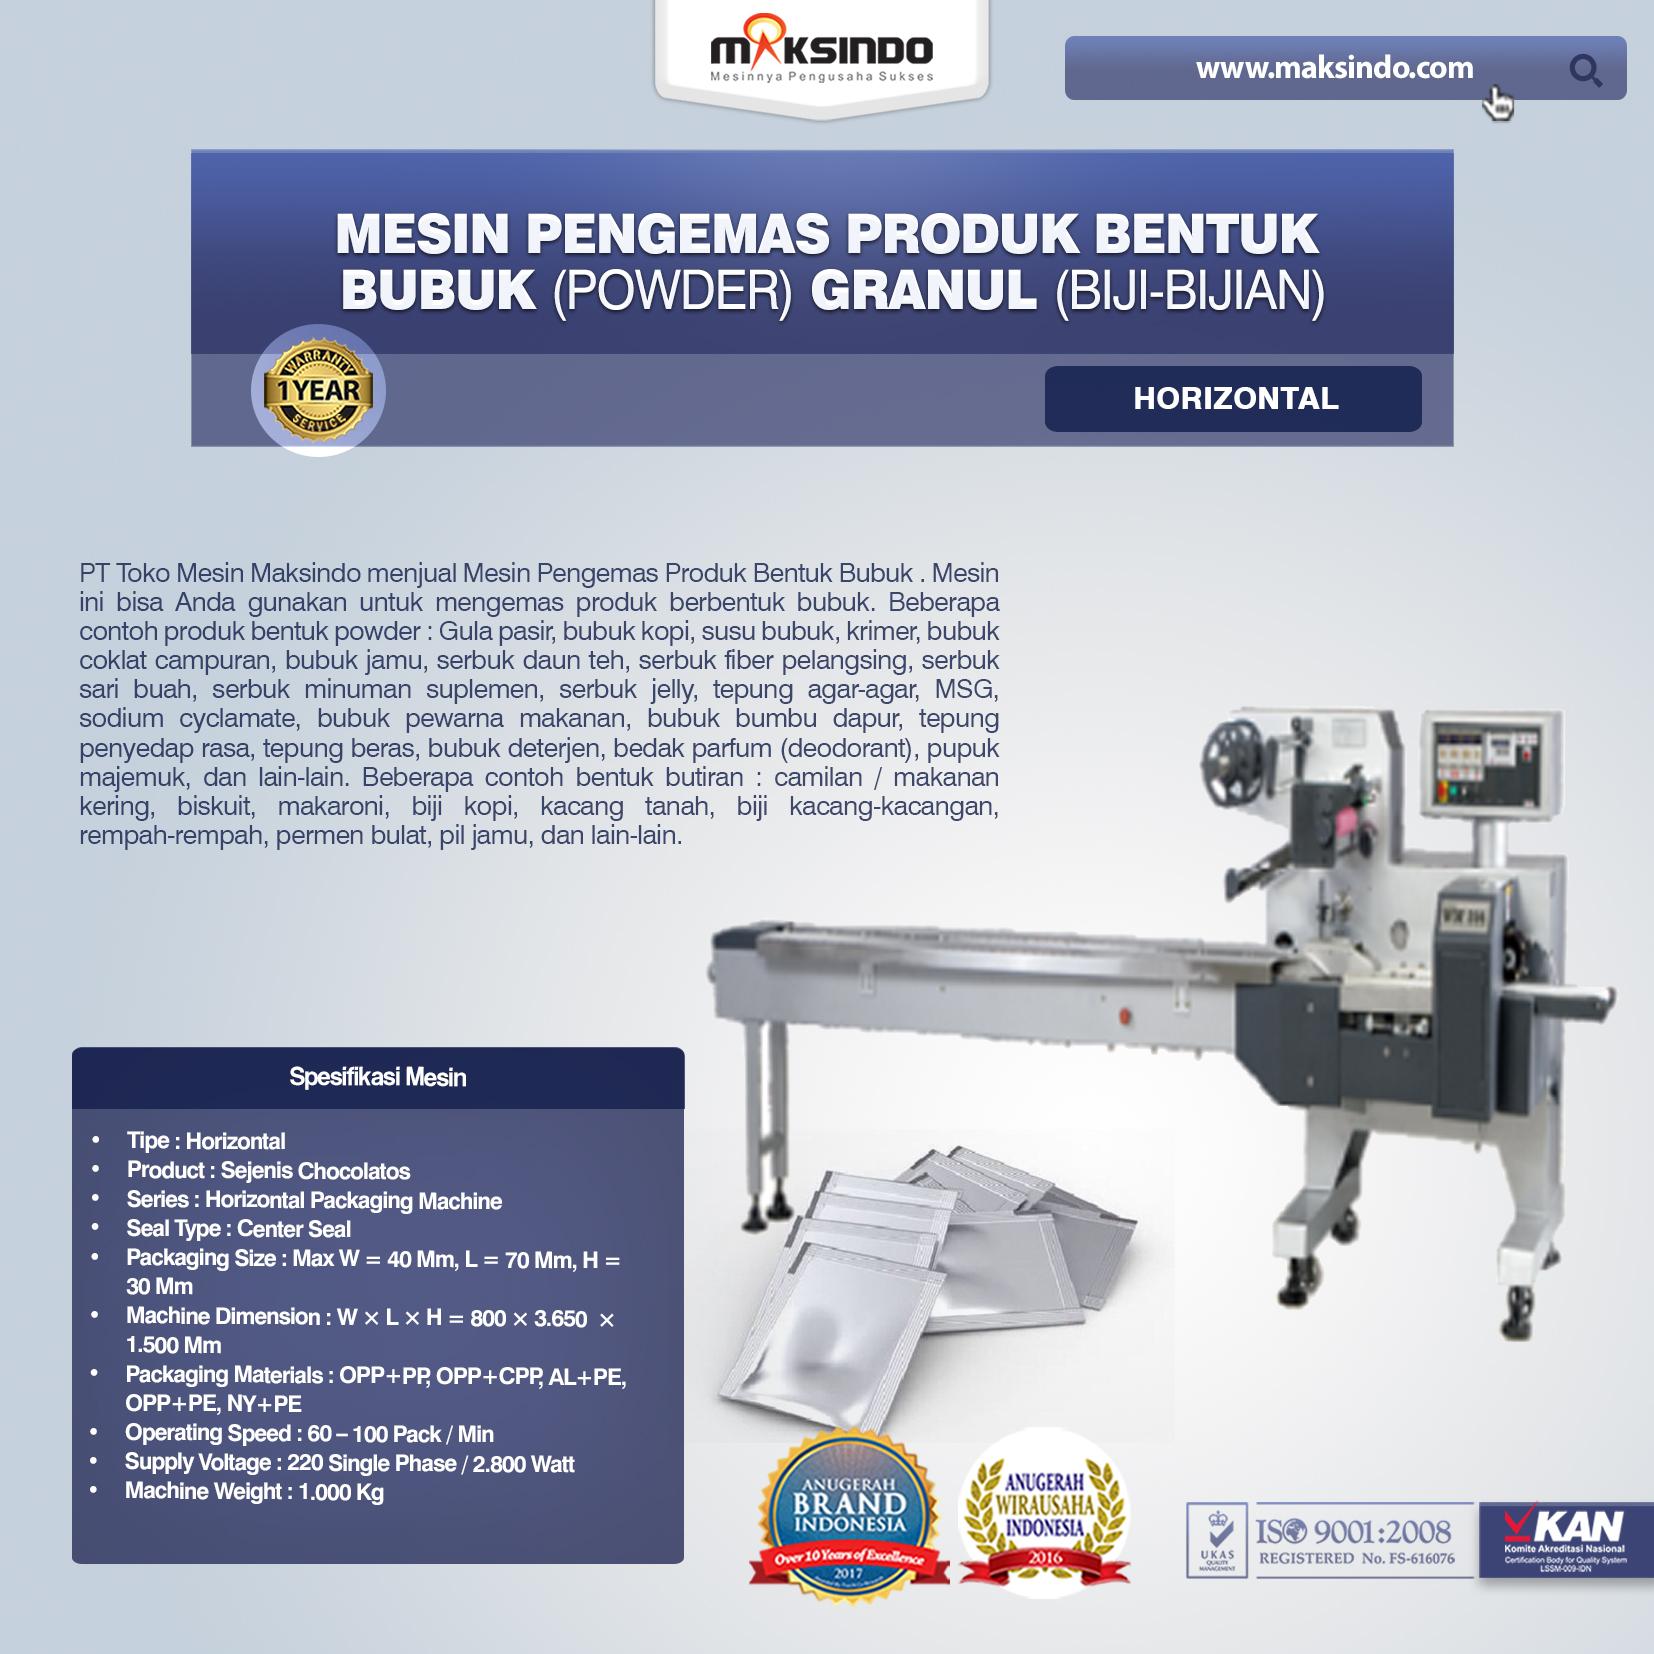 Mesin Pengemas Produk Bentuk BUBUK (POWDER) GRANUL (BIJI-BIJIAN) Horizontal